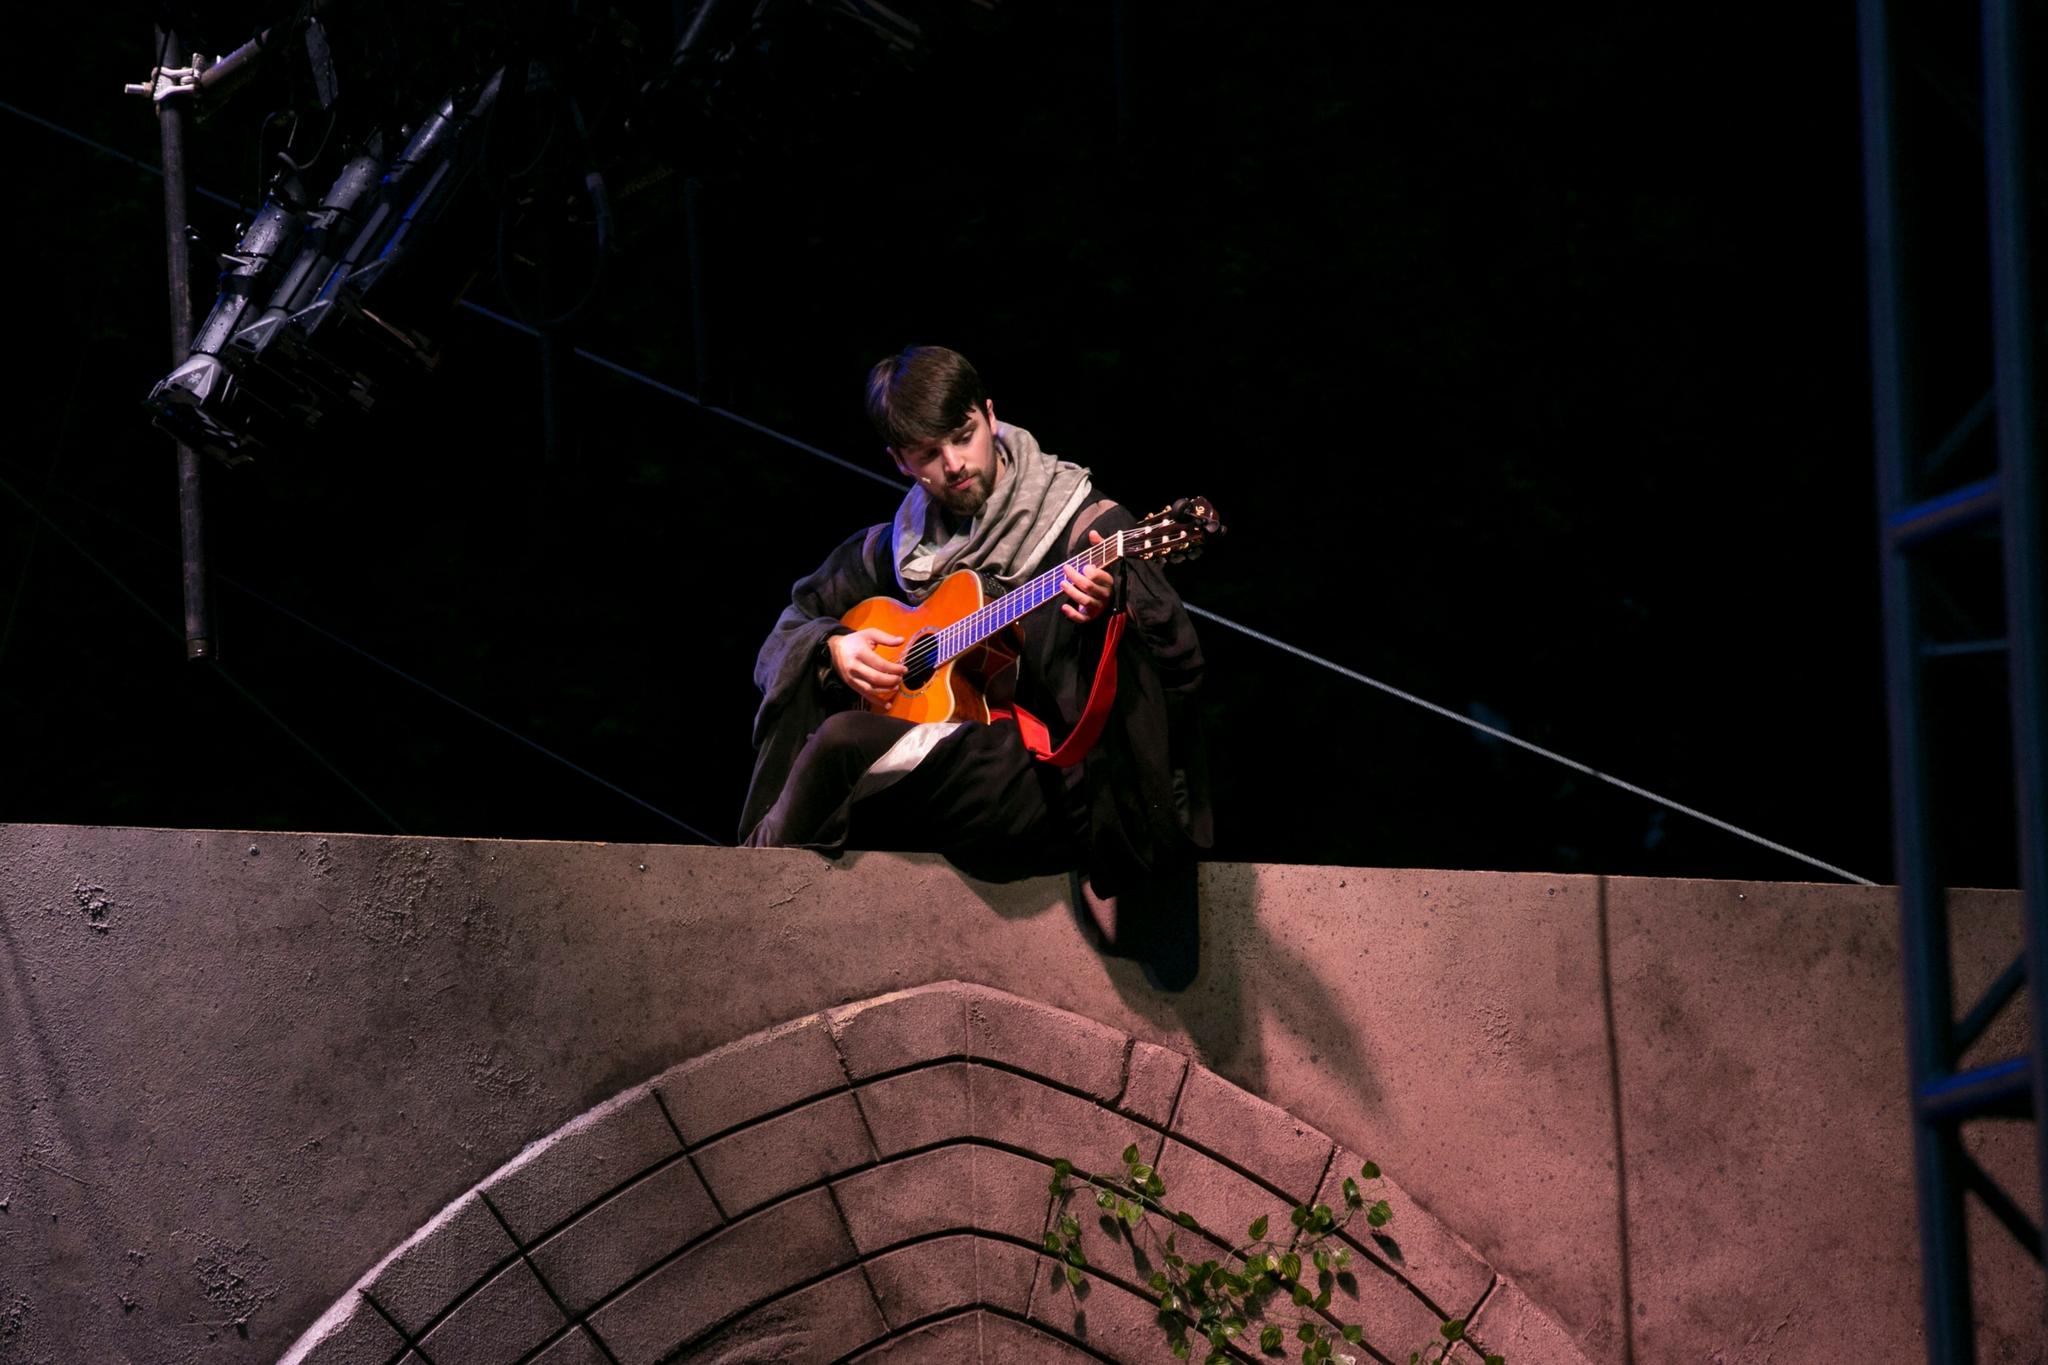 Alex Deroo (Musician) in Romeo & Juliet, Shakespeare on the Common 2017-Photo by Evgenia Eliseeva